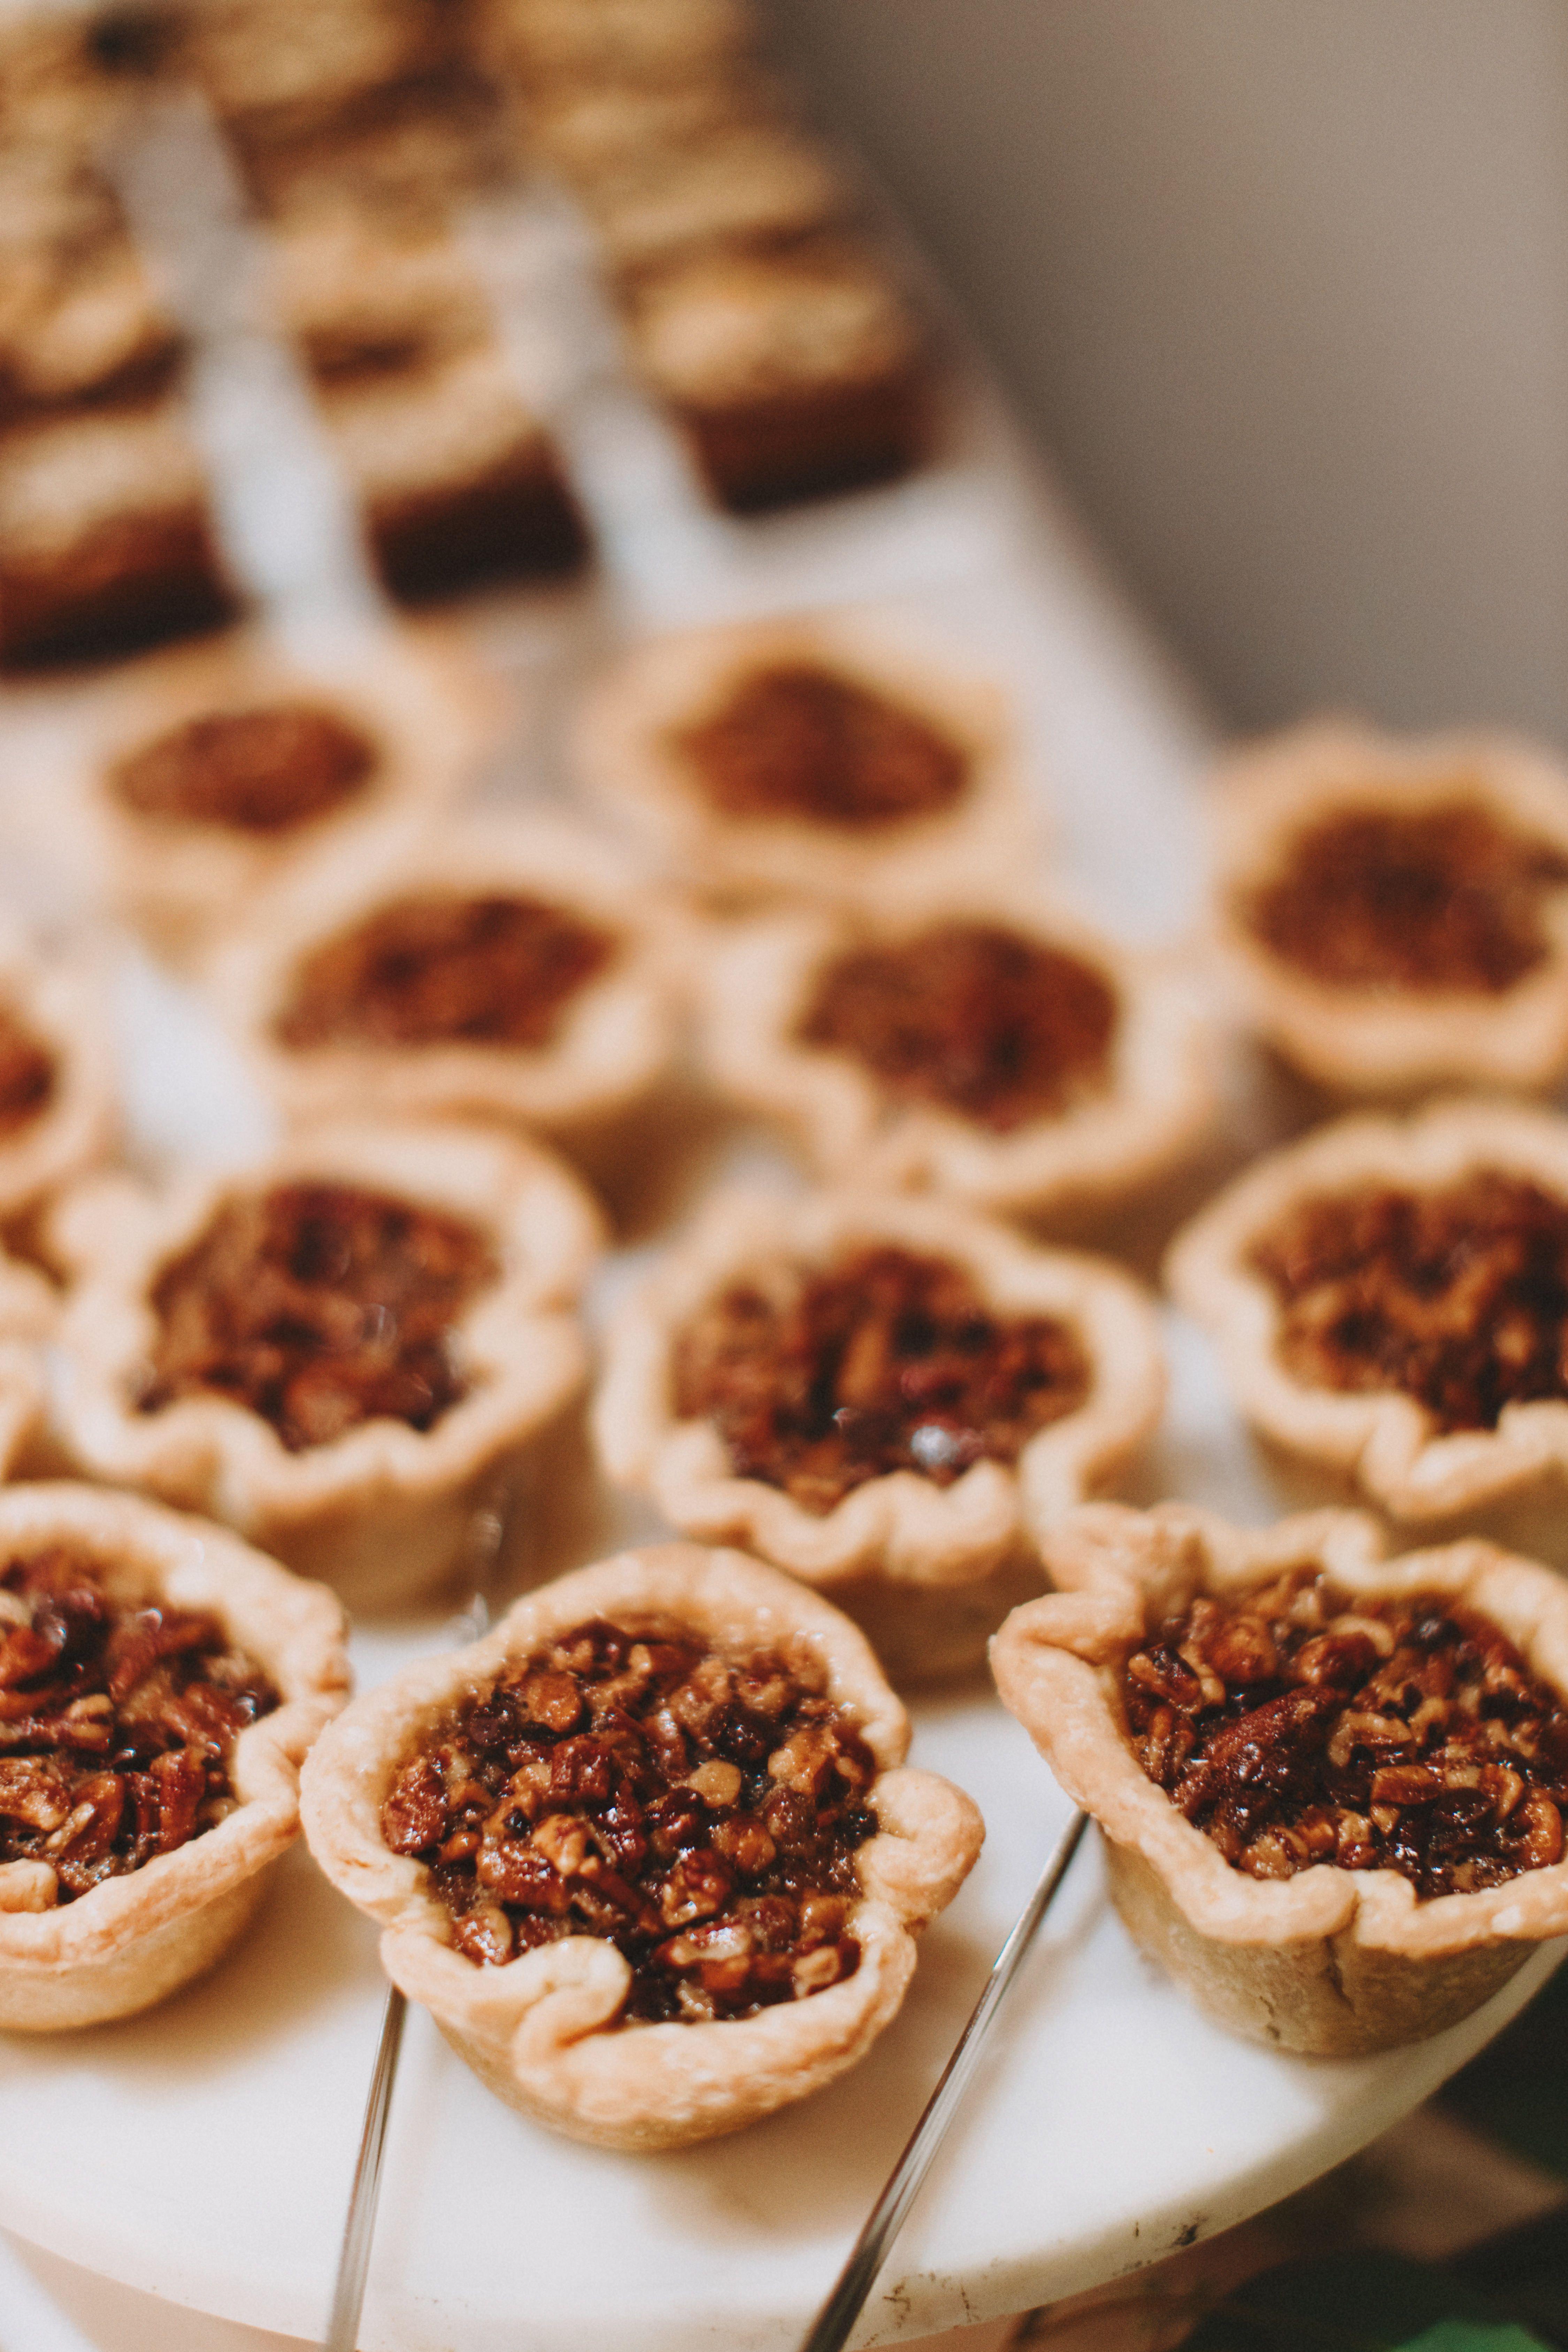 Mini dessert #goals -   16 rustic desserts Plating ideas